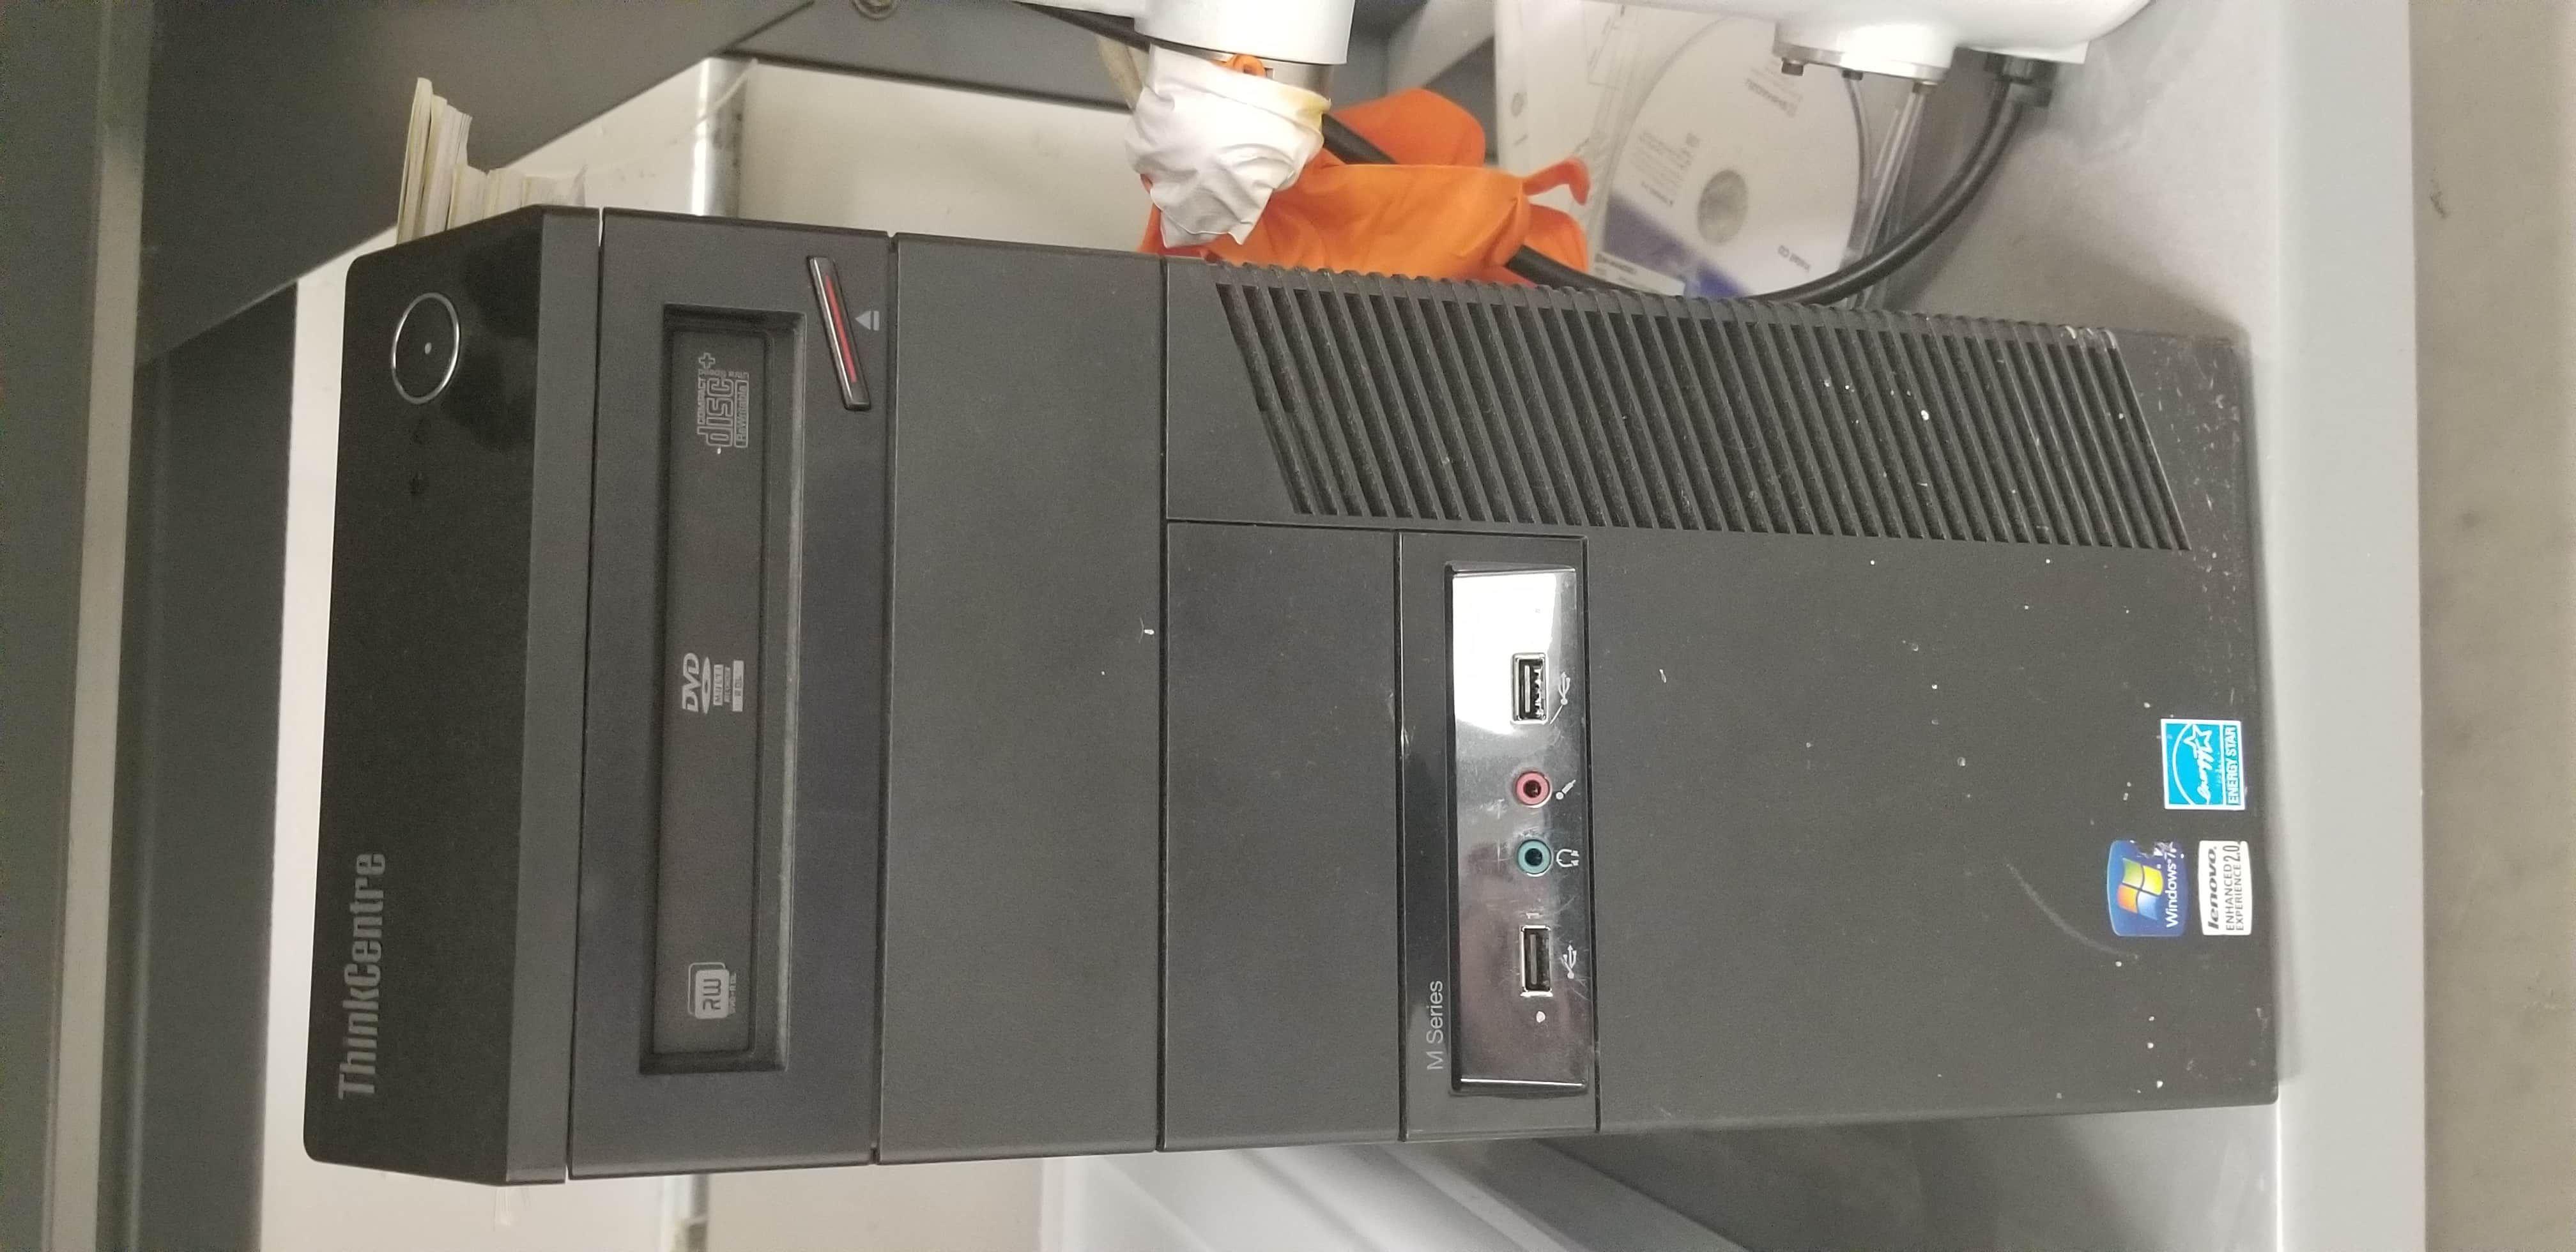 Shimadzu ICPE-OES 9810 with Shimadzu Autosampler